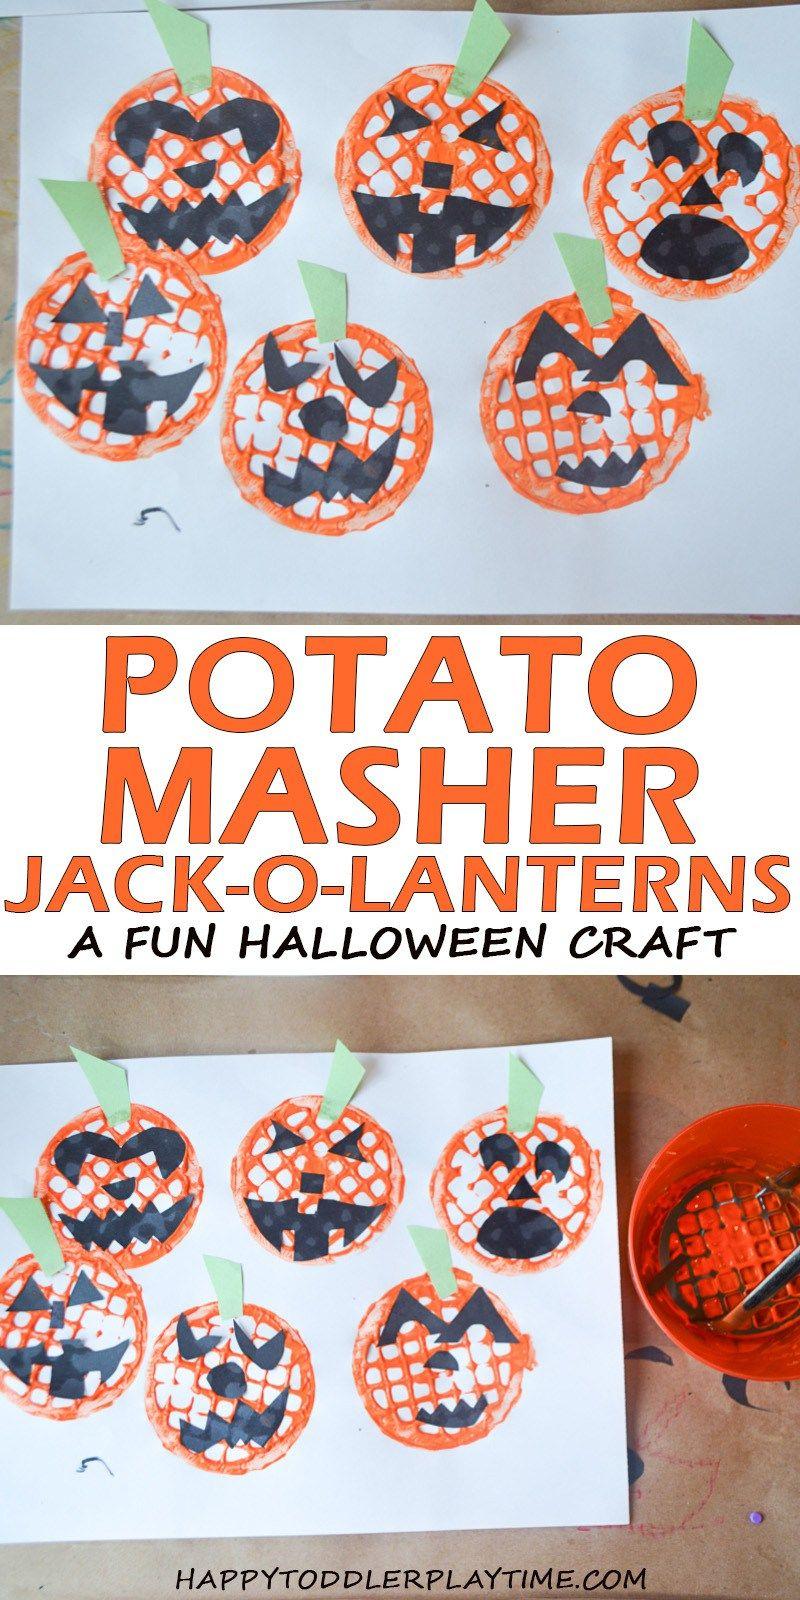 Potato Masher Jack-o-Lanterns #pumpkincraftspreschool